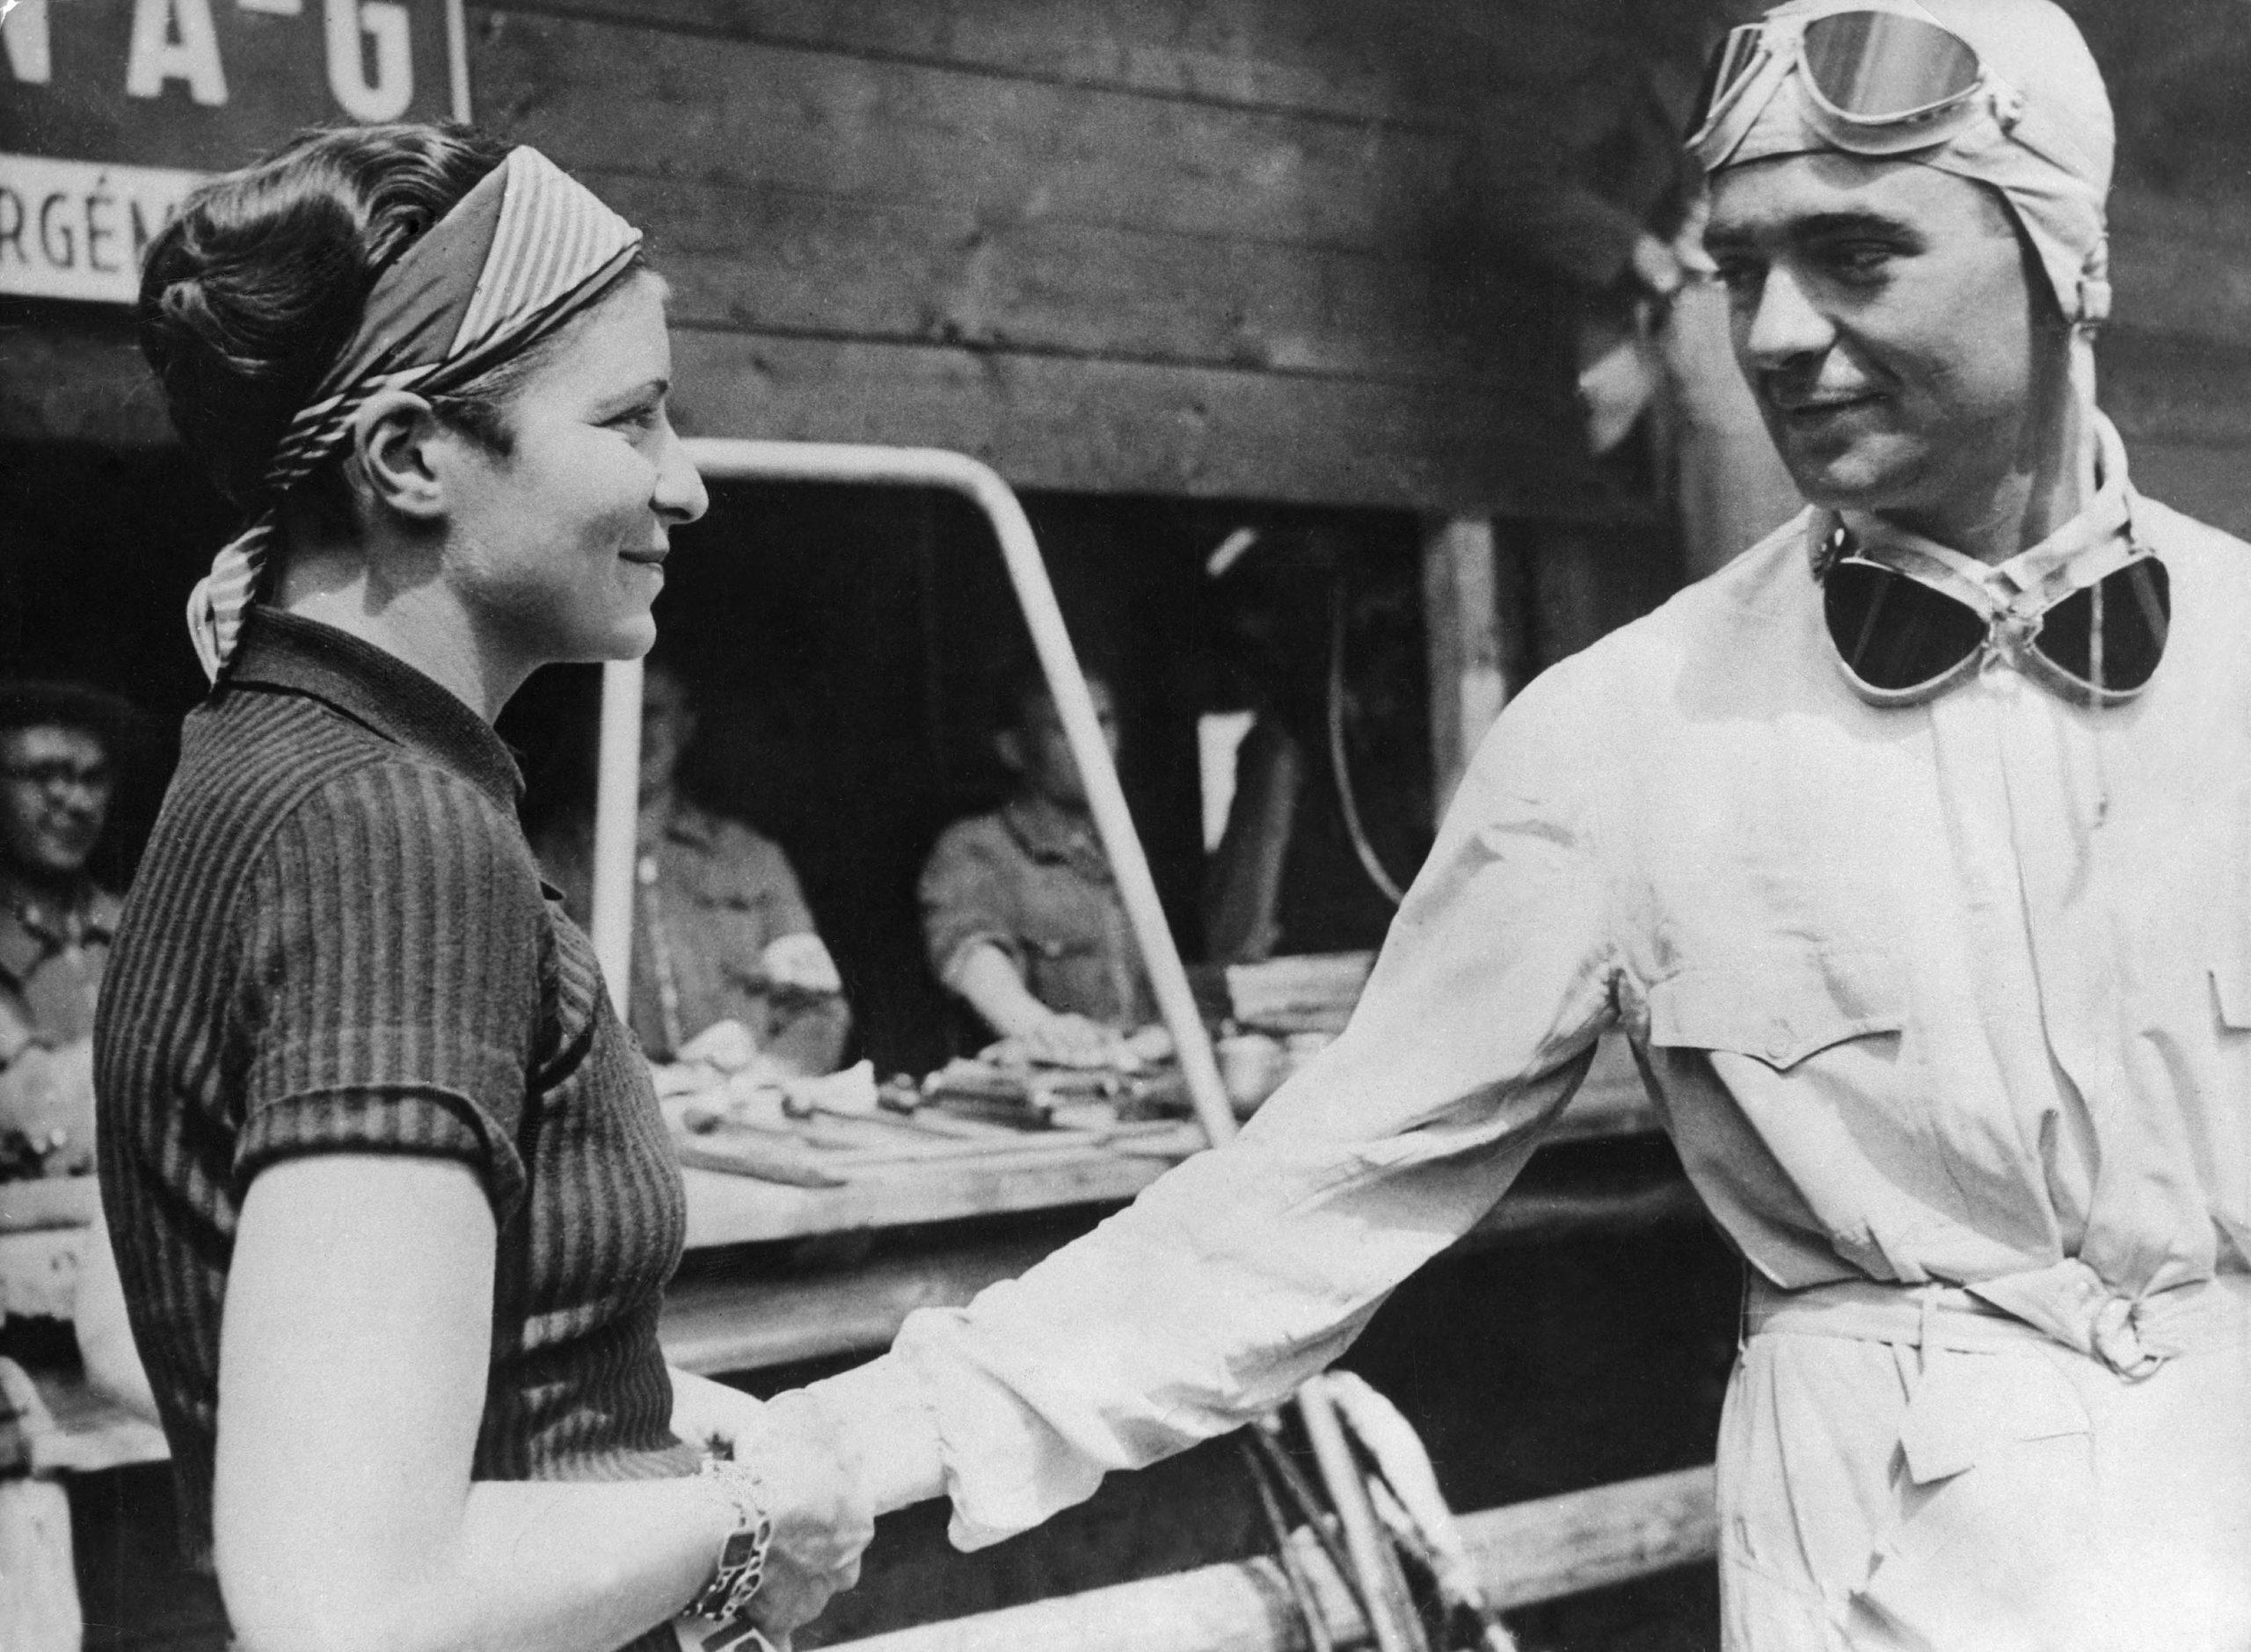 ernd-Rosemeyer-with-his-wife-Elly-Beinhorn